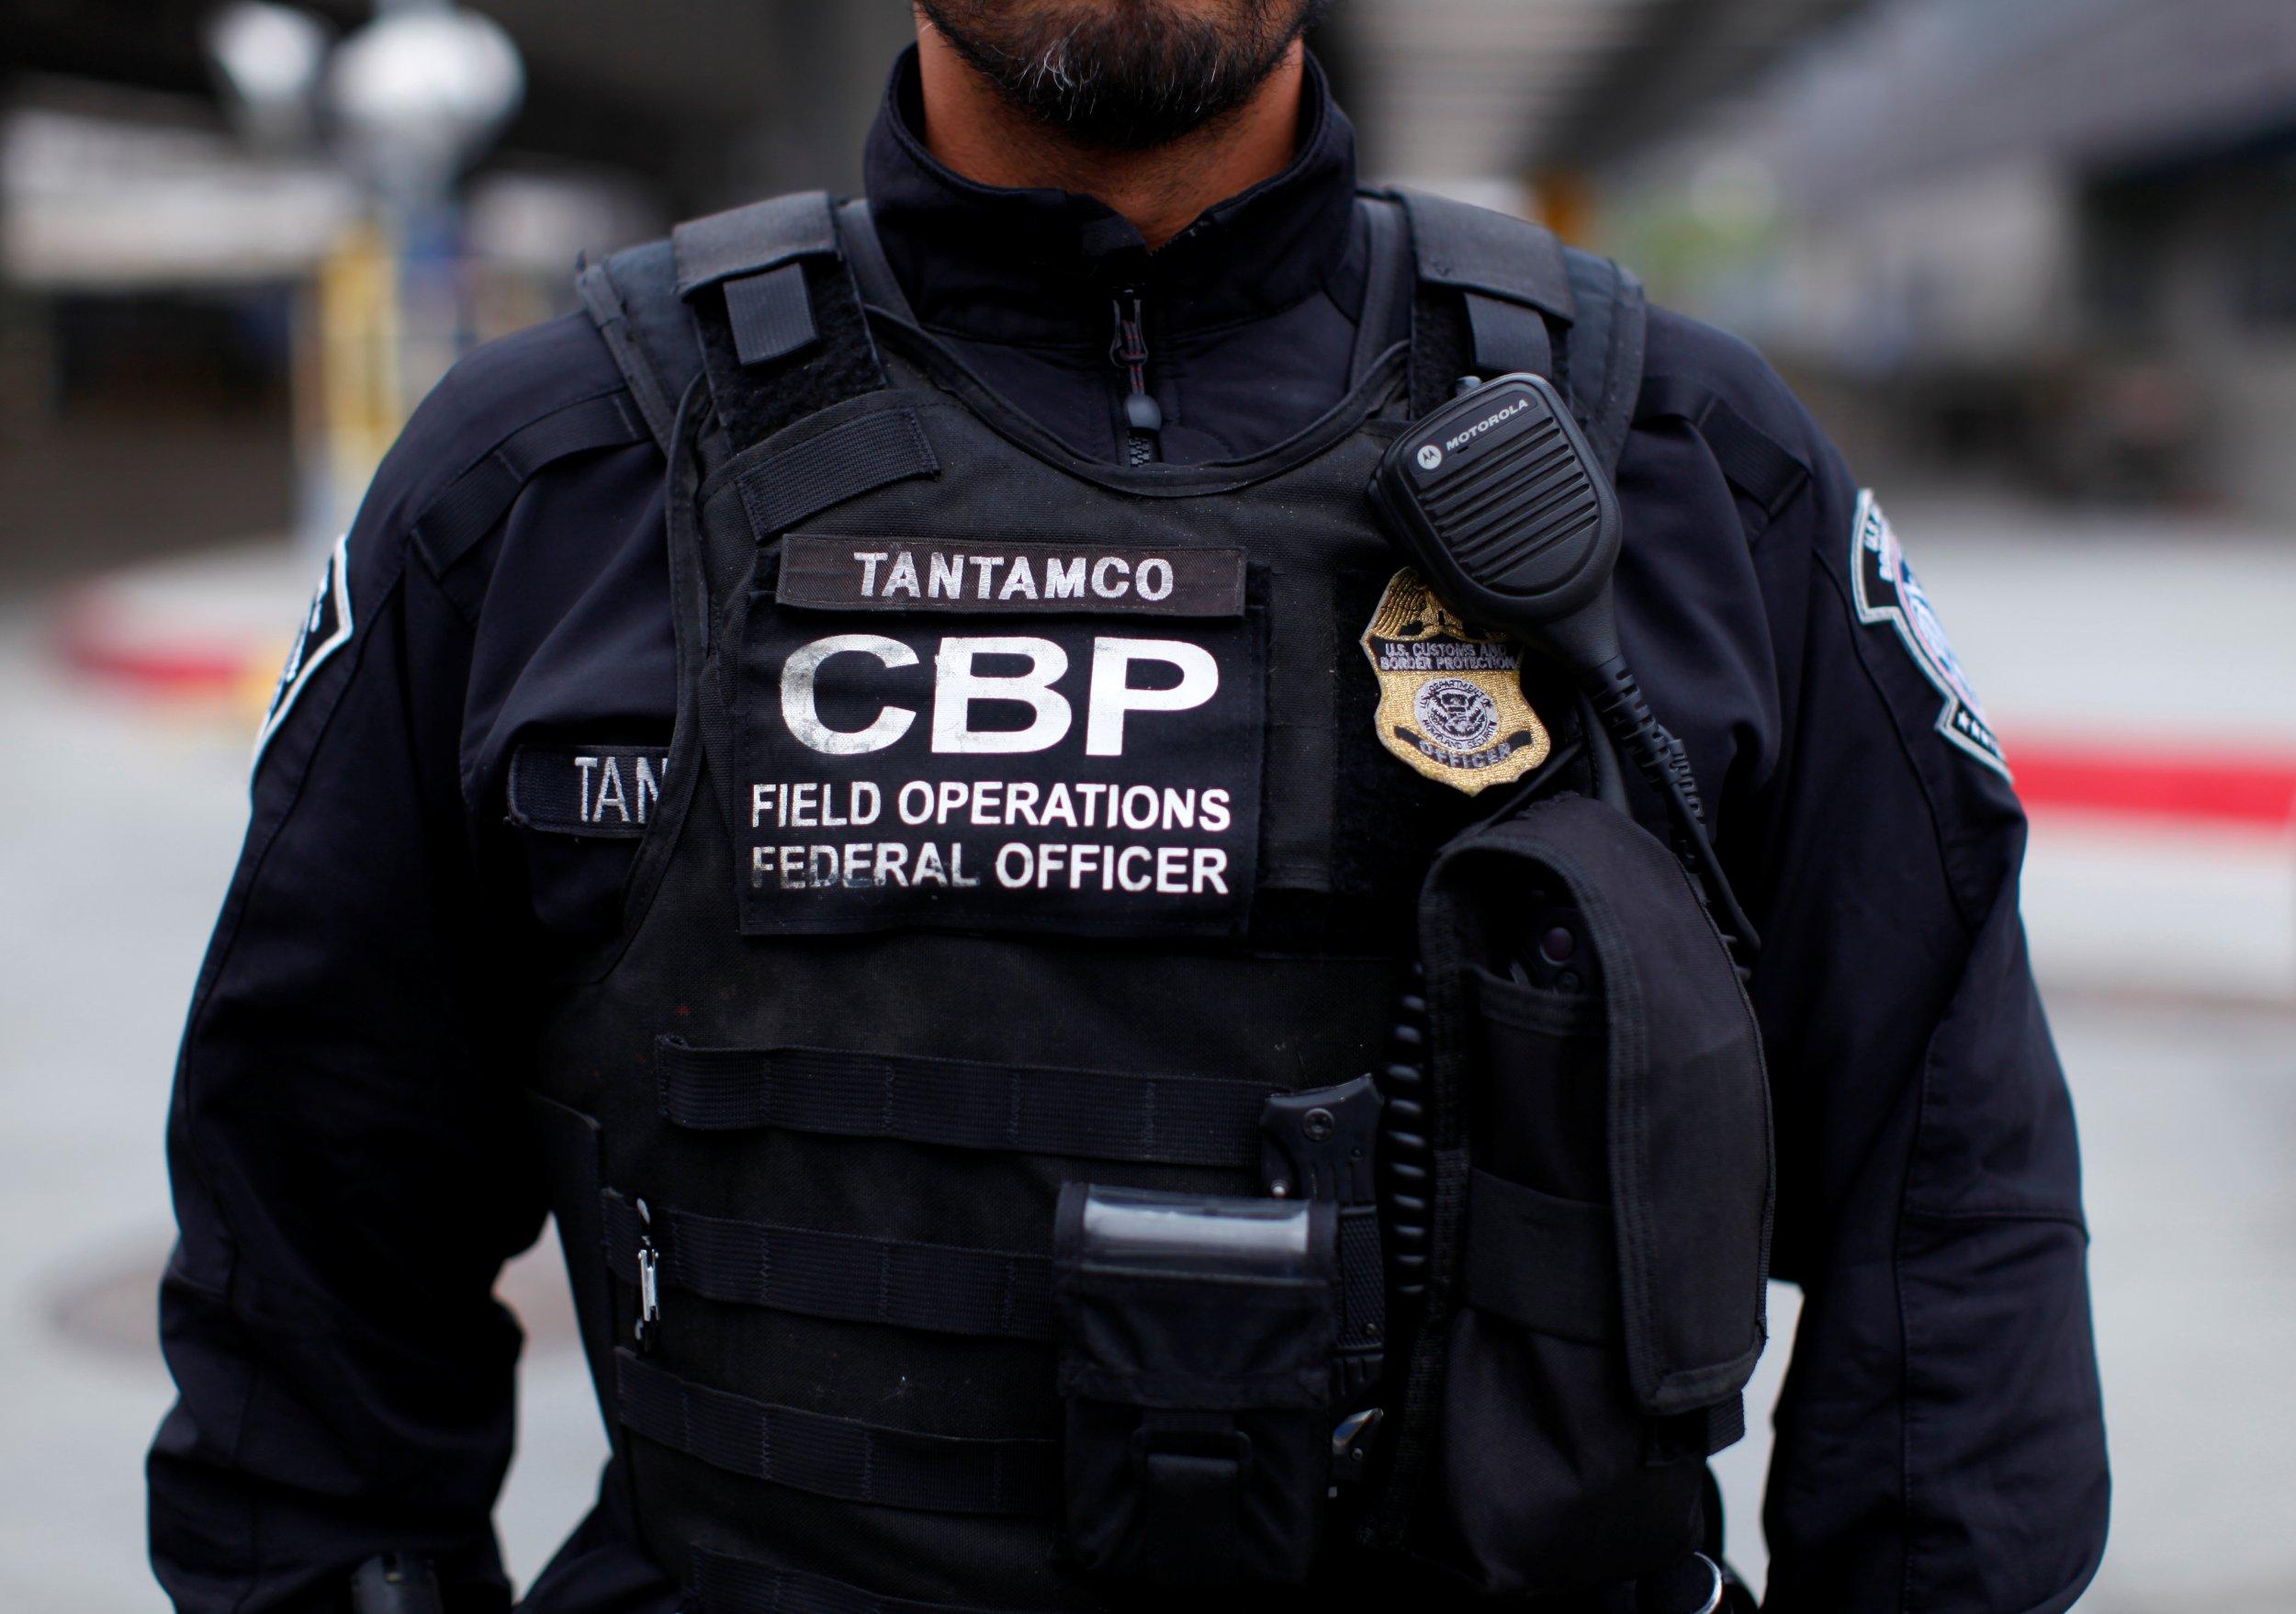 International Executive Protection